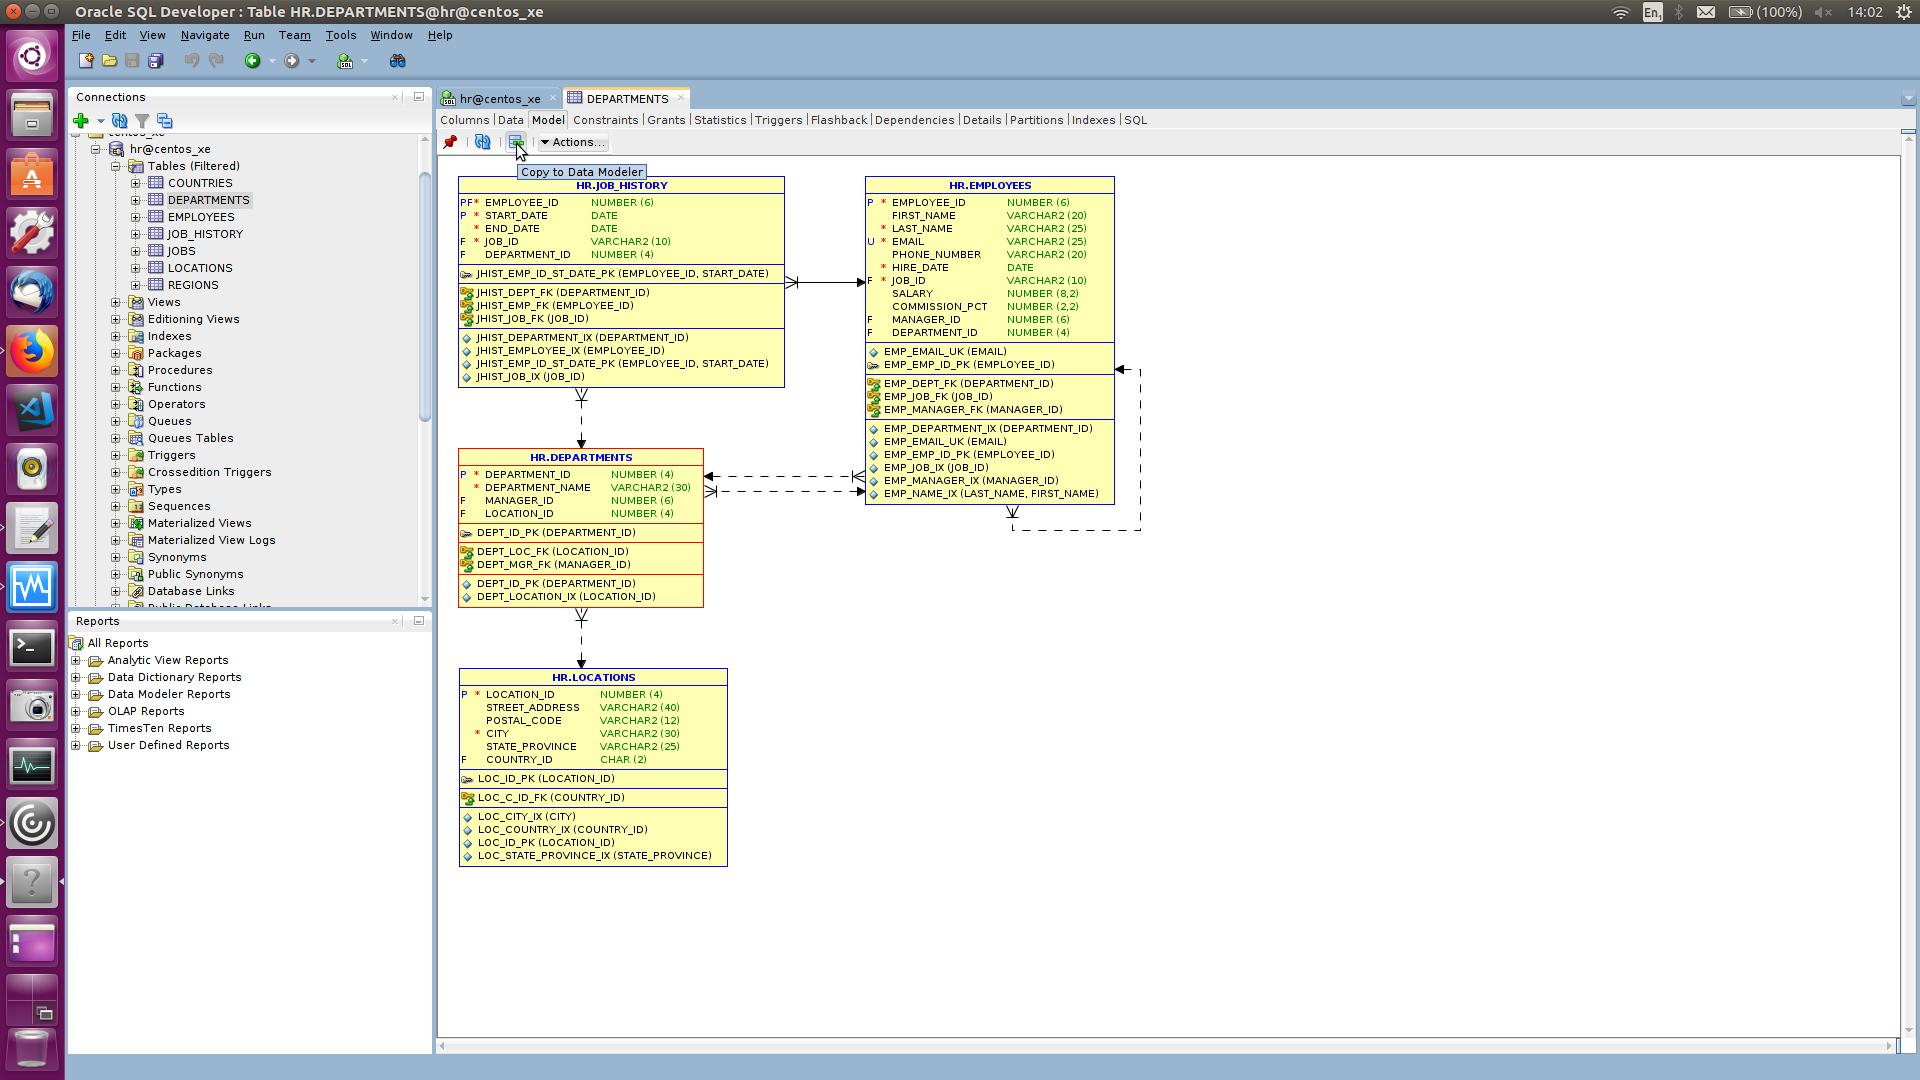 First Steps In Sqldeveloper Data Modeler | The Anti-Kyte with regard to Er Diagram Sql Developer